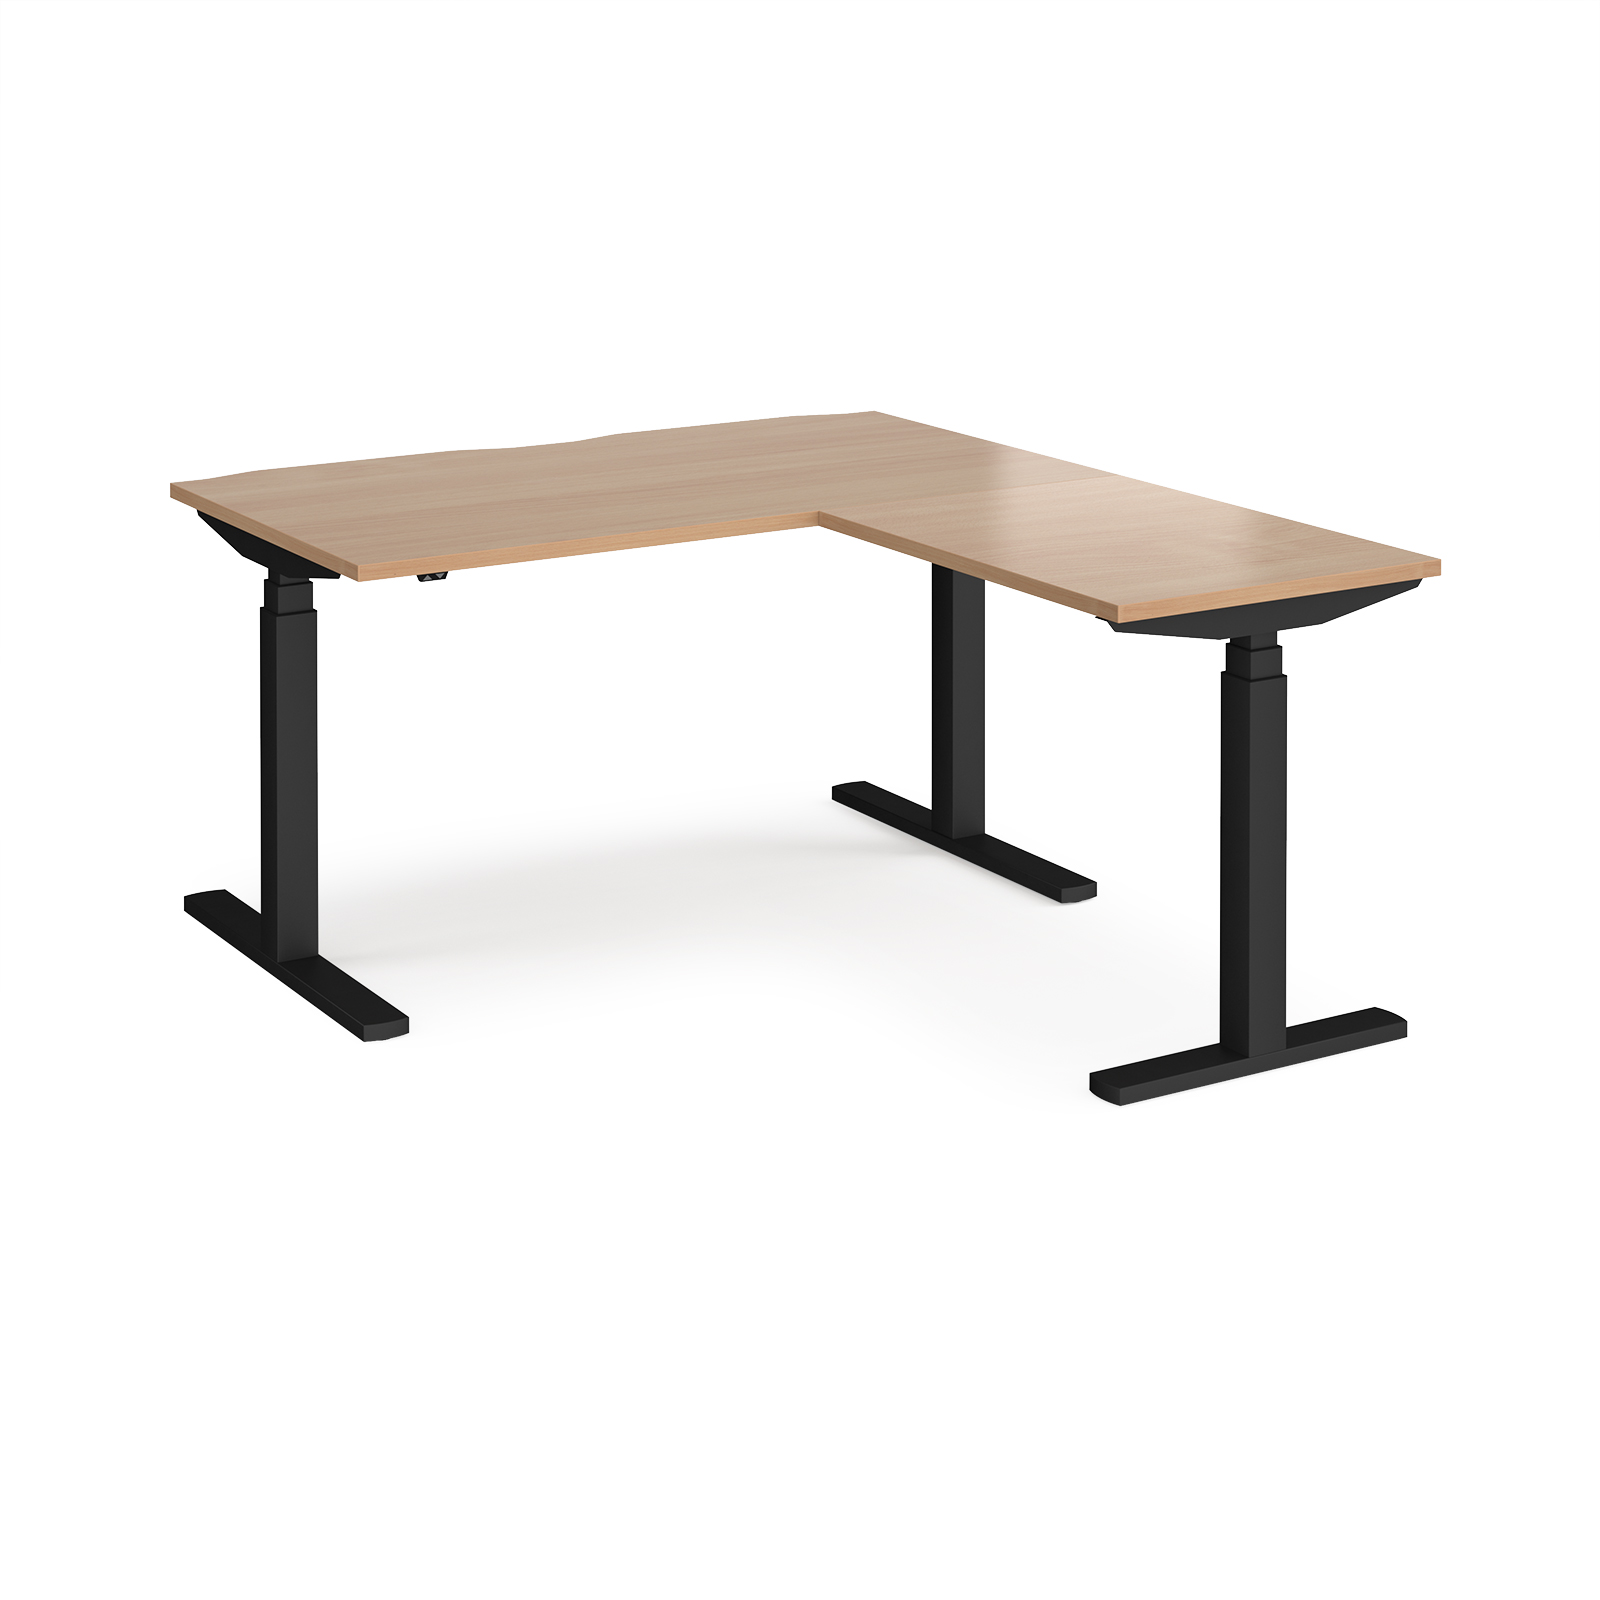 Sit Stand Desks Elev8 Touch desk with return